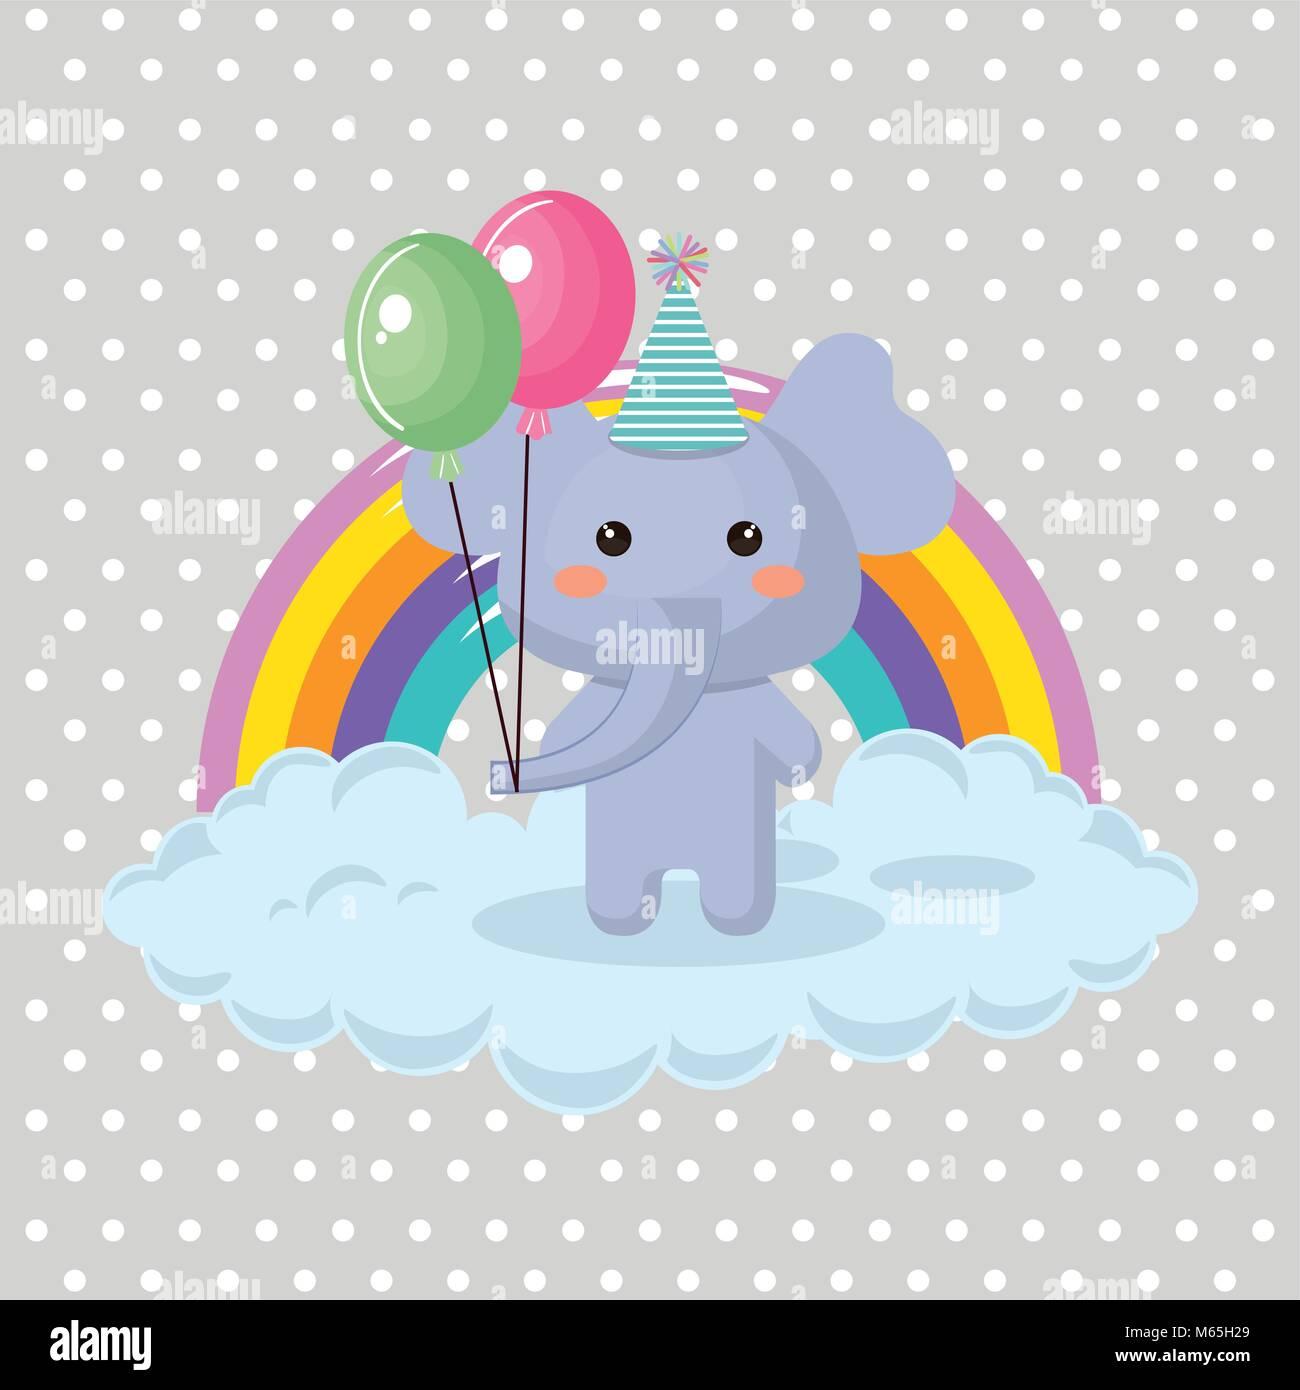 Cute Elephant With Balloons Air Party Sweet Kawaii Birthday Card